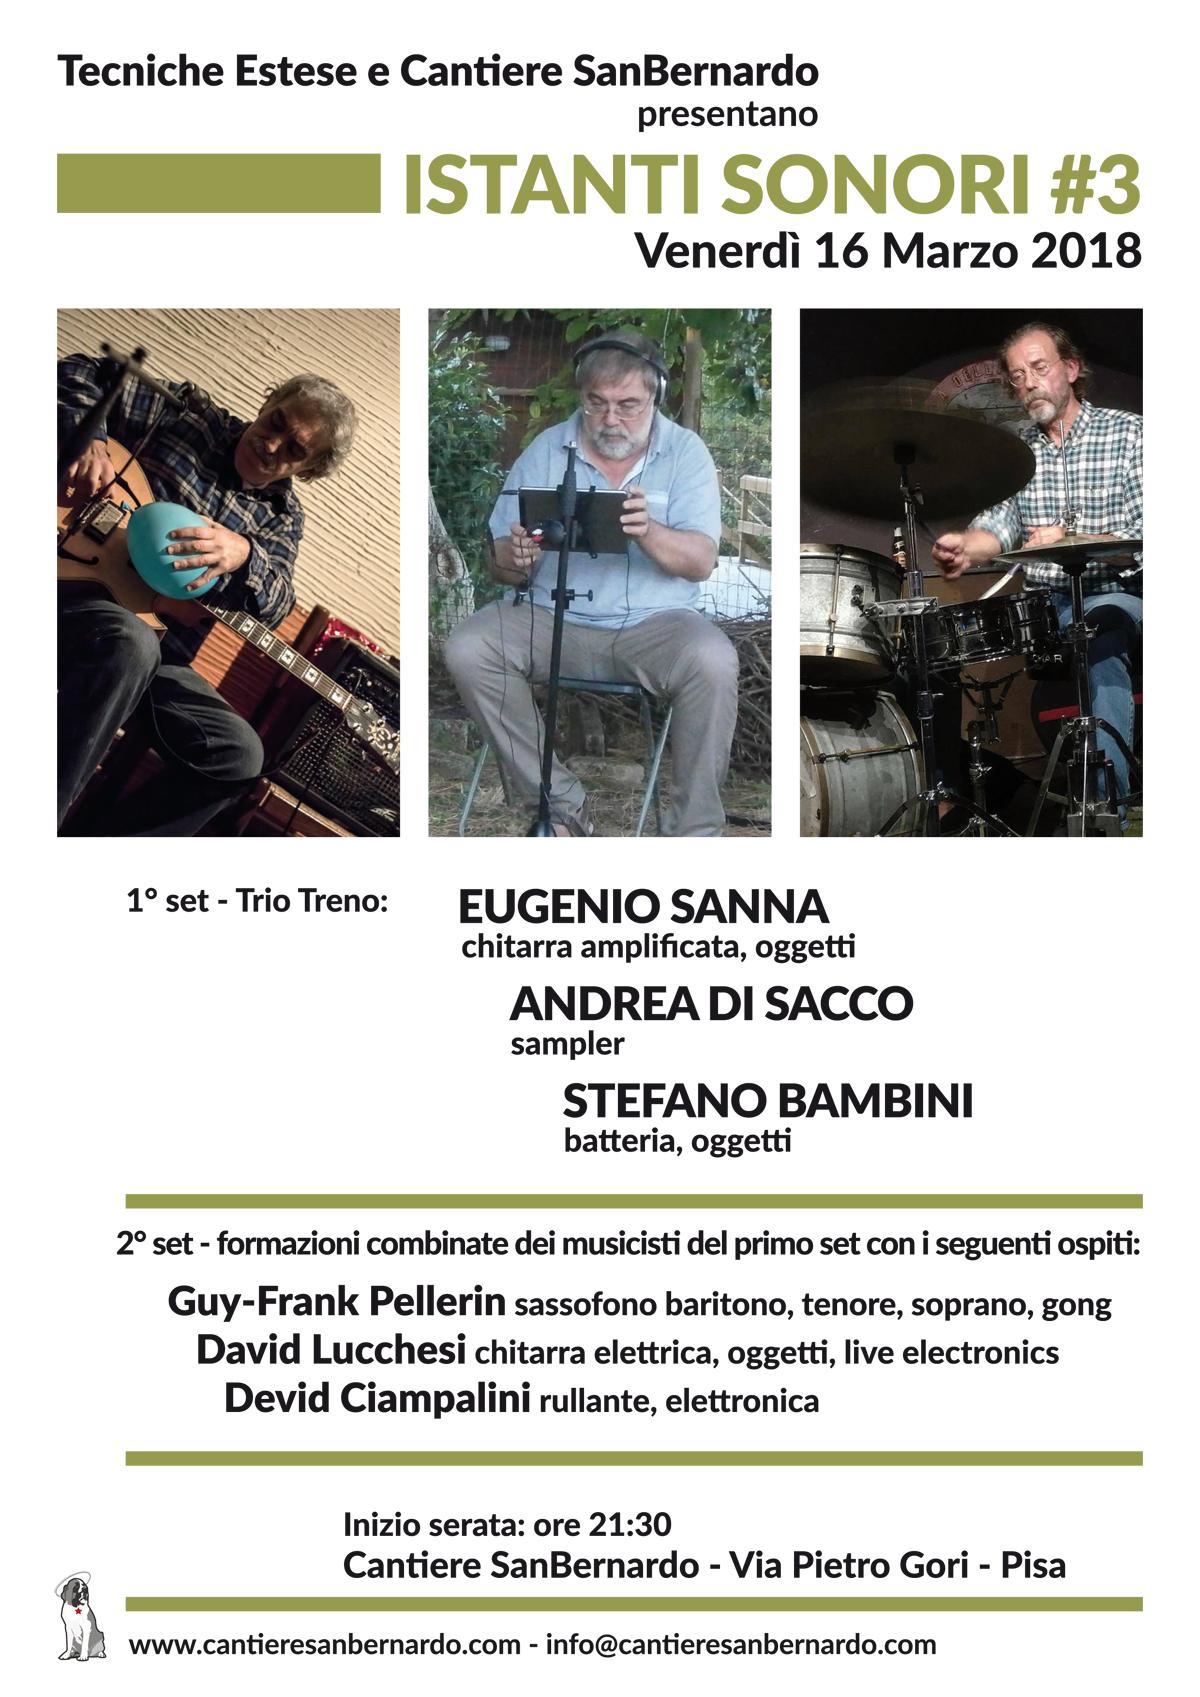 Istanti Sonori #3 16-03-2018.indd